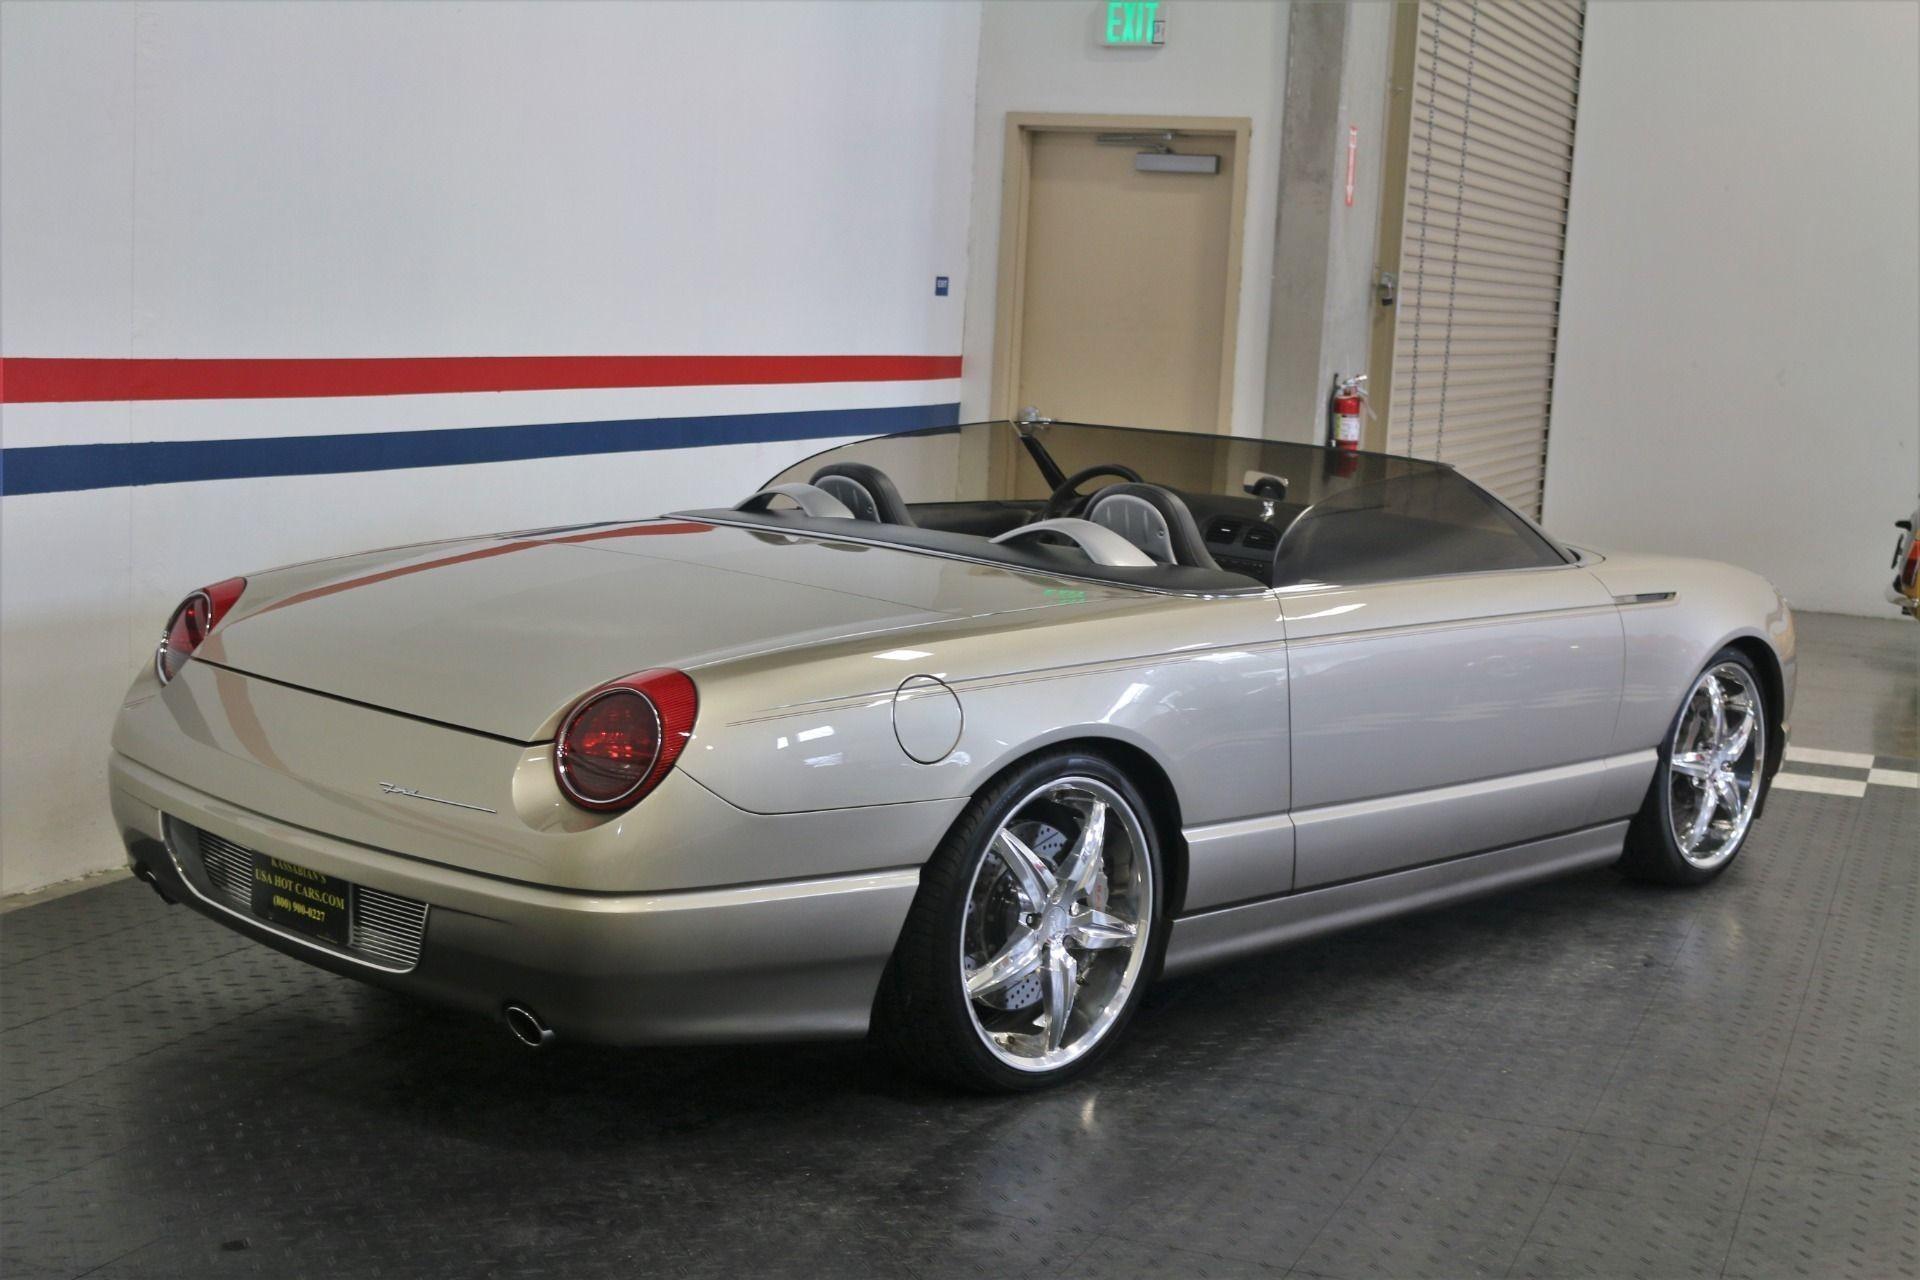 Ford Speedbird 2002 года от ателье Чипа Фуза